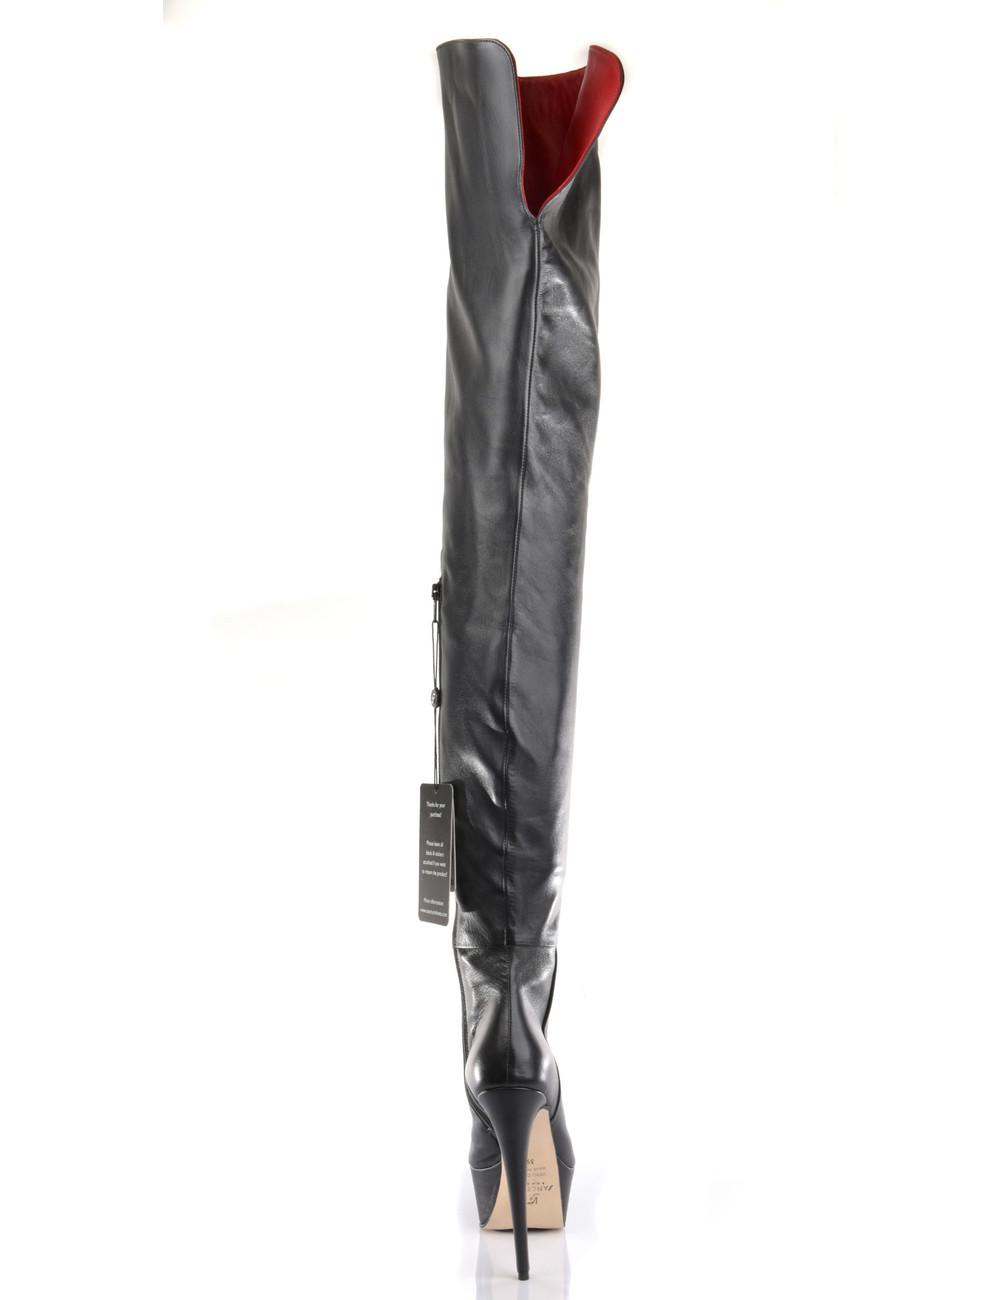 Sanctum Custom Custom High Italian crotch boots ISIS with platform heels in real leather